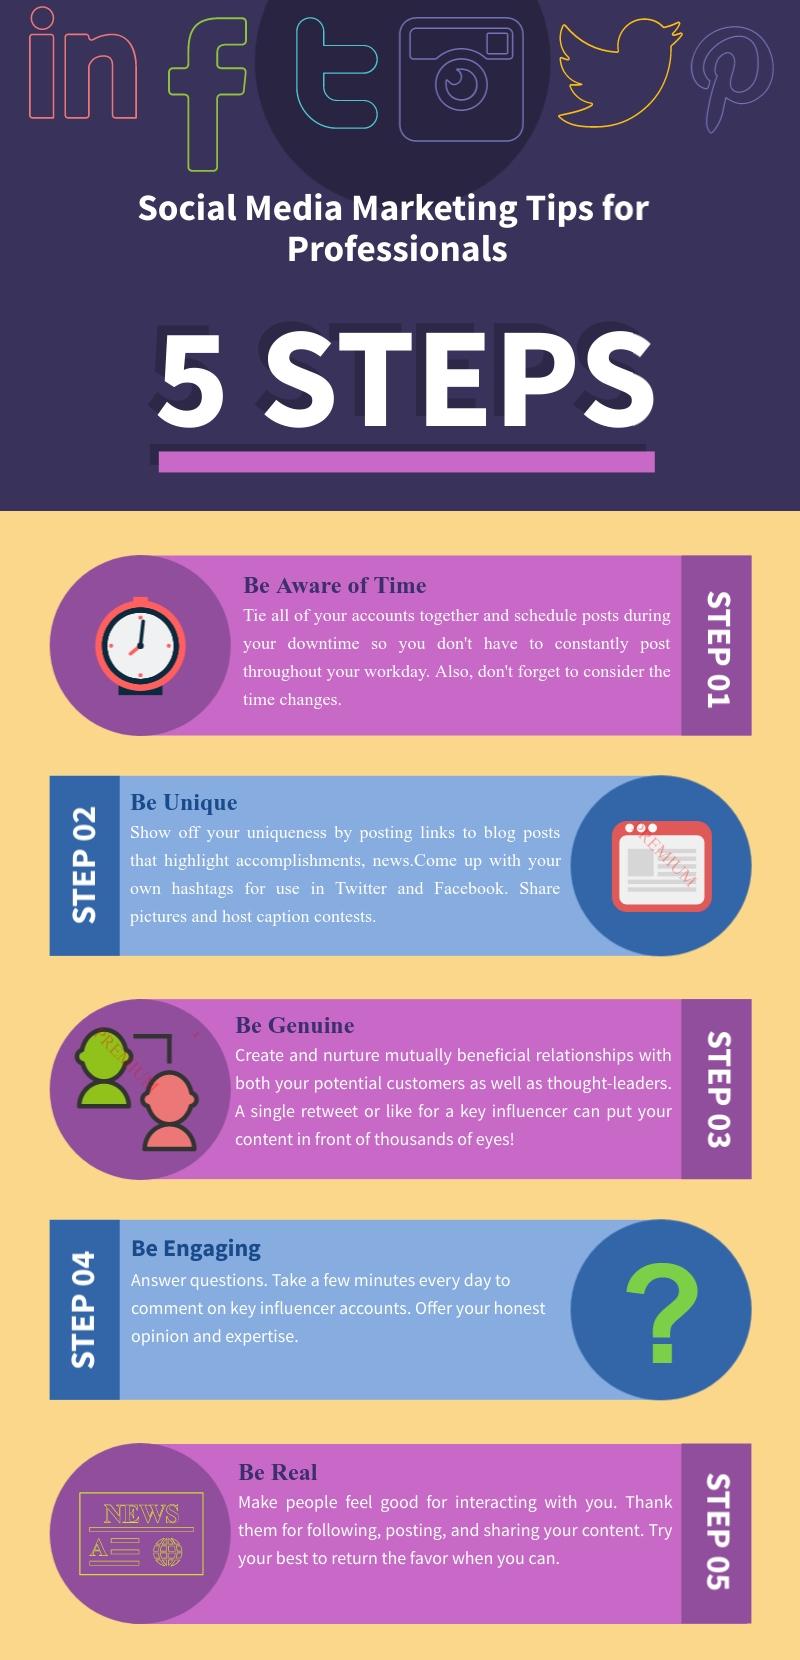 5 Social Media Marketing Tips for Professionals